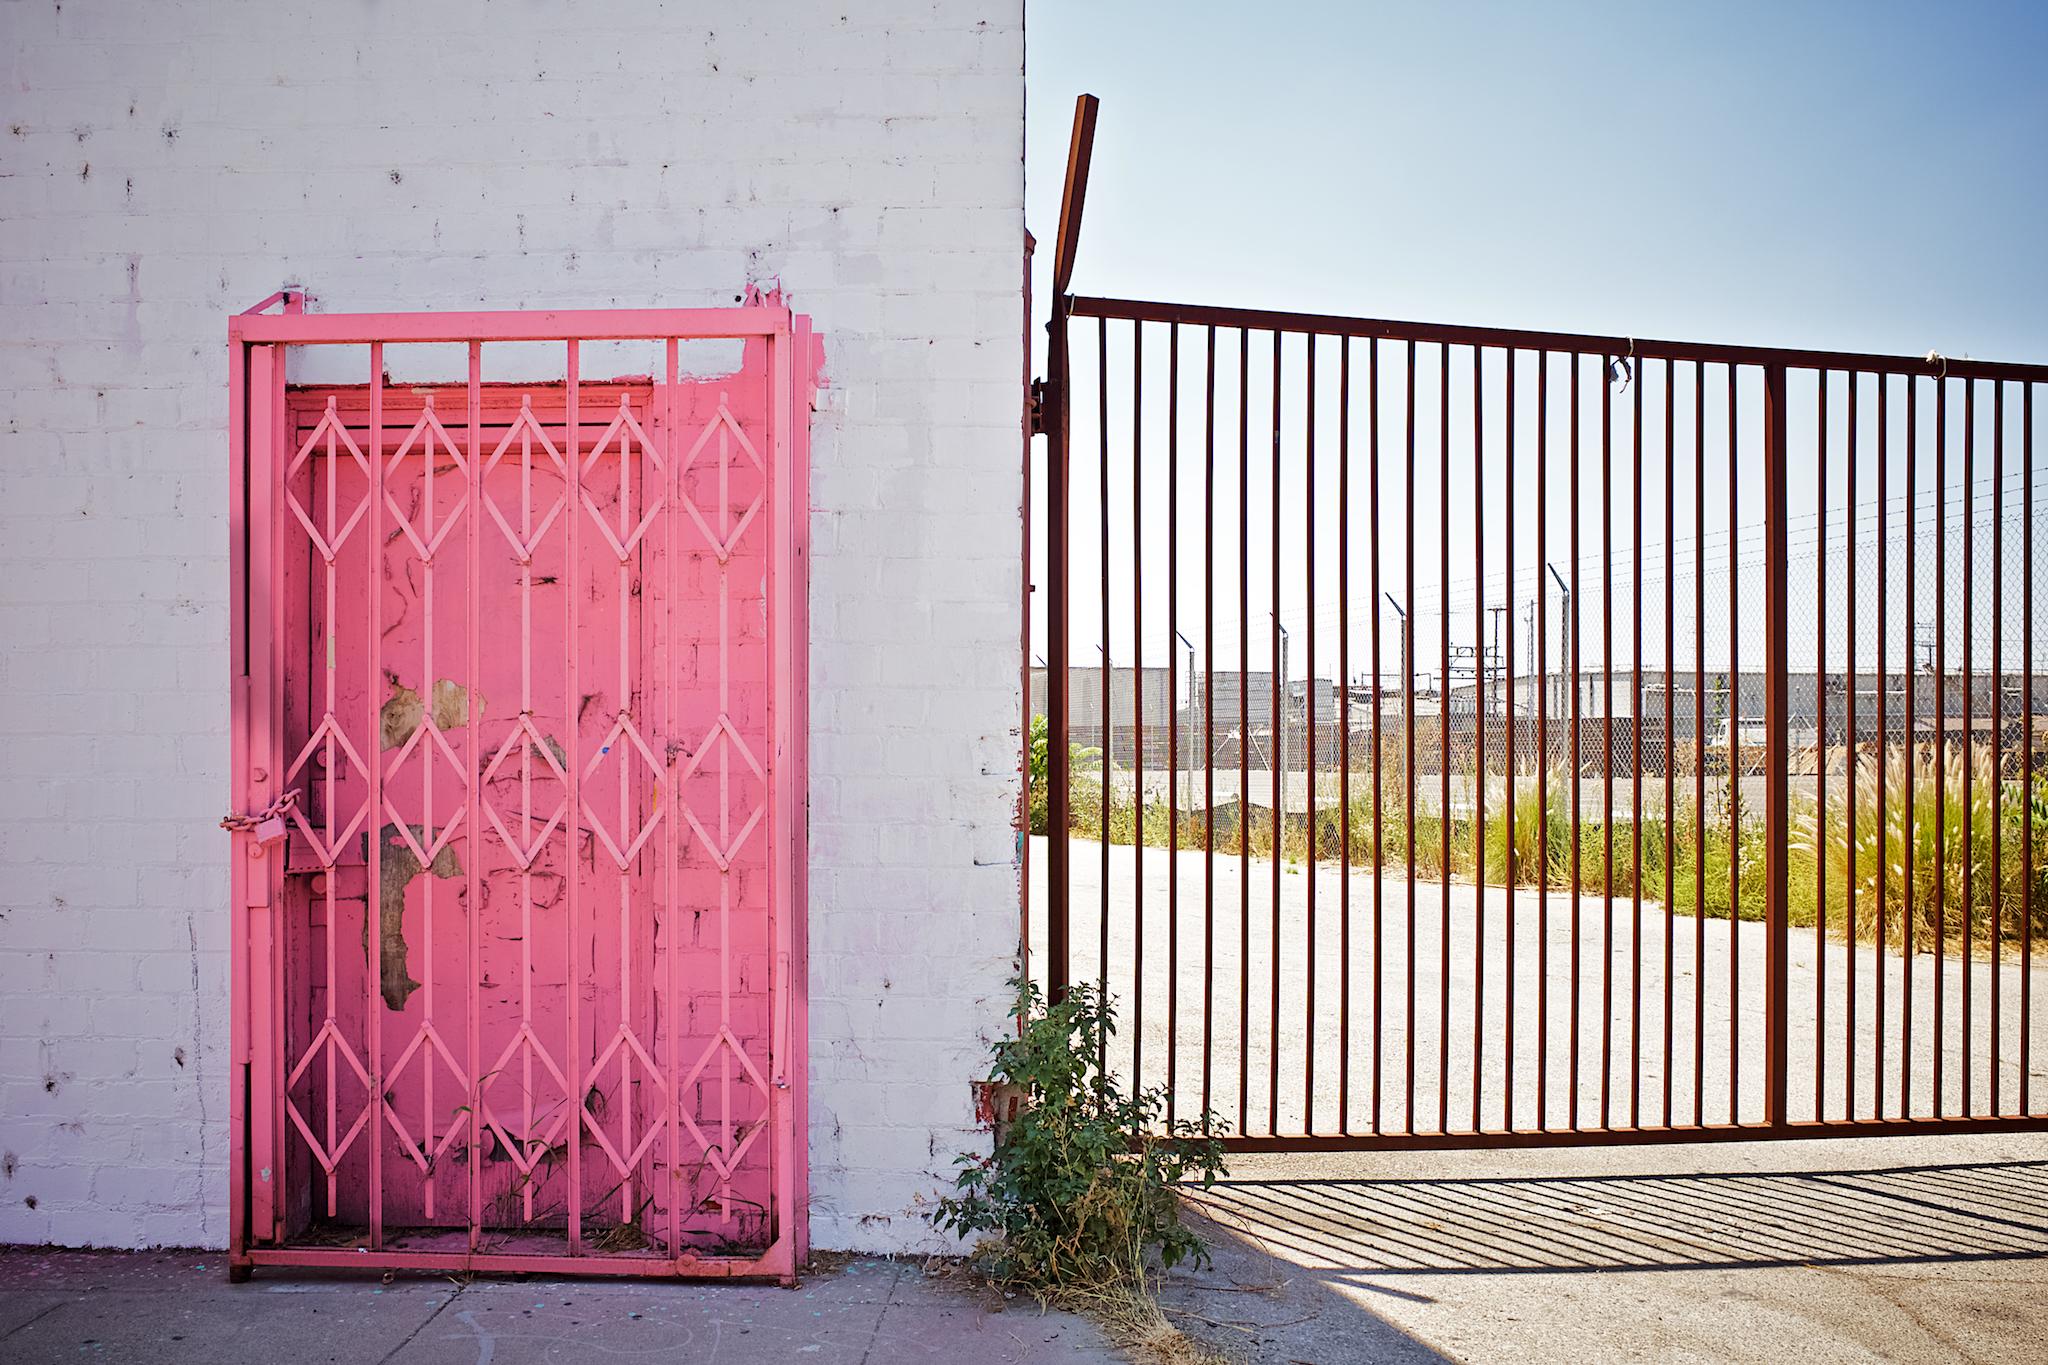 ceethreedom street photos.102.jpg